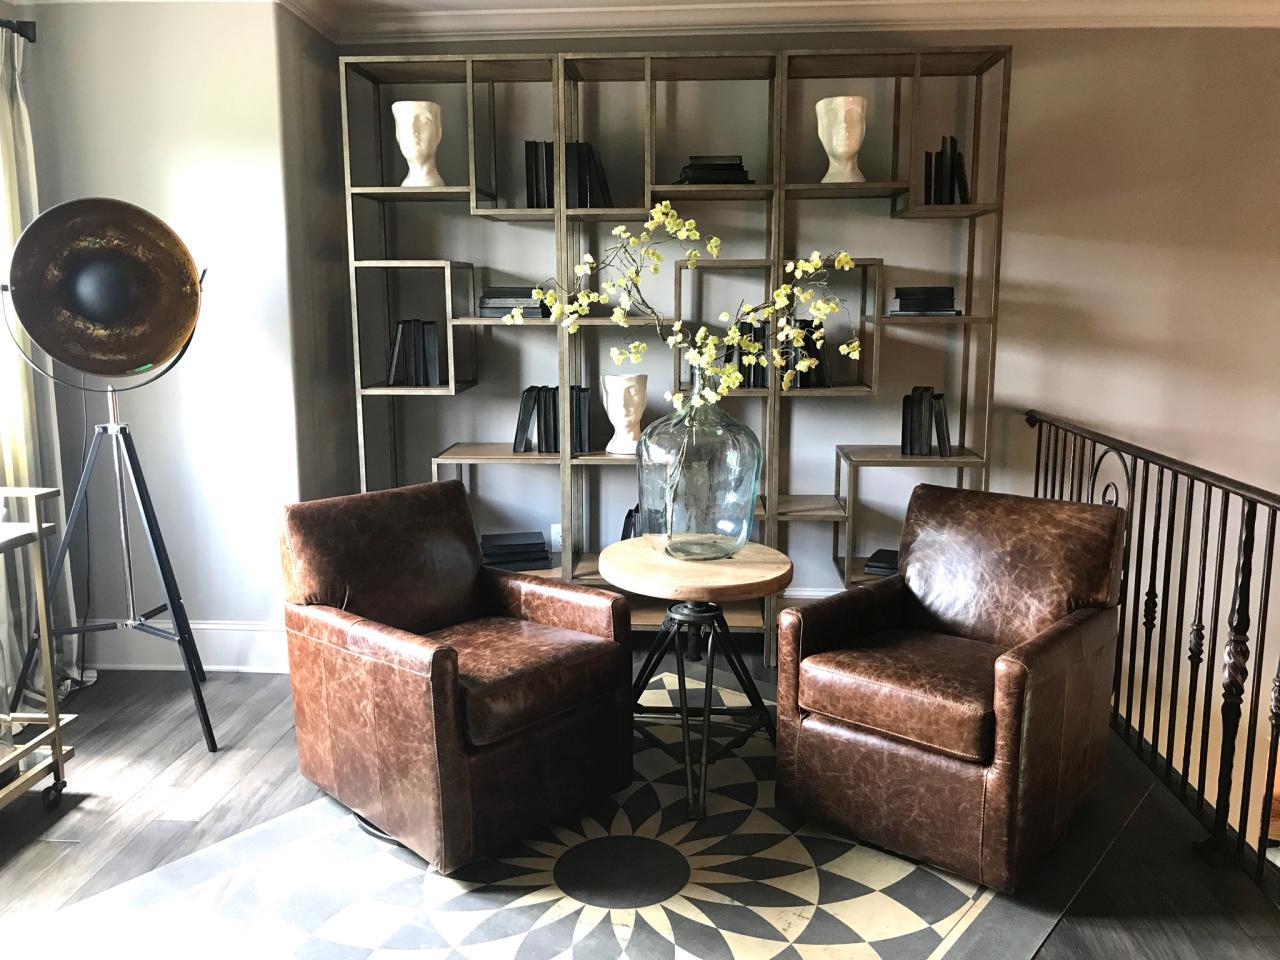 Photo By: Cheryl Turner, Andrew Johnson, Jeffrey Hansen; Furniture By Bill  Cox Furniture; Photo By Farima